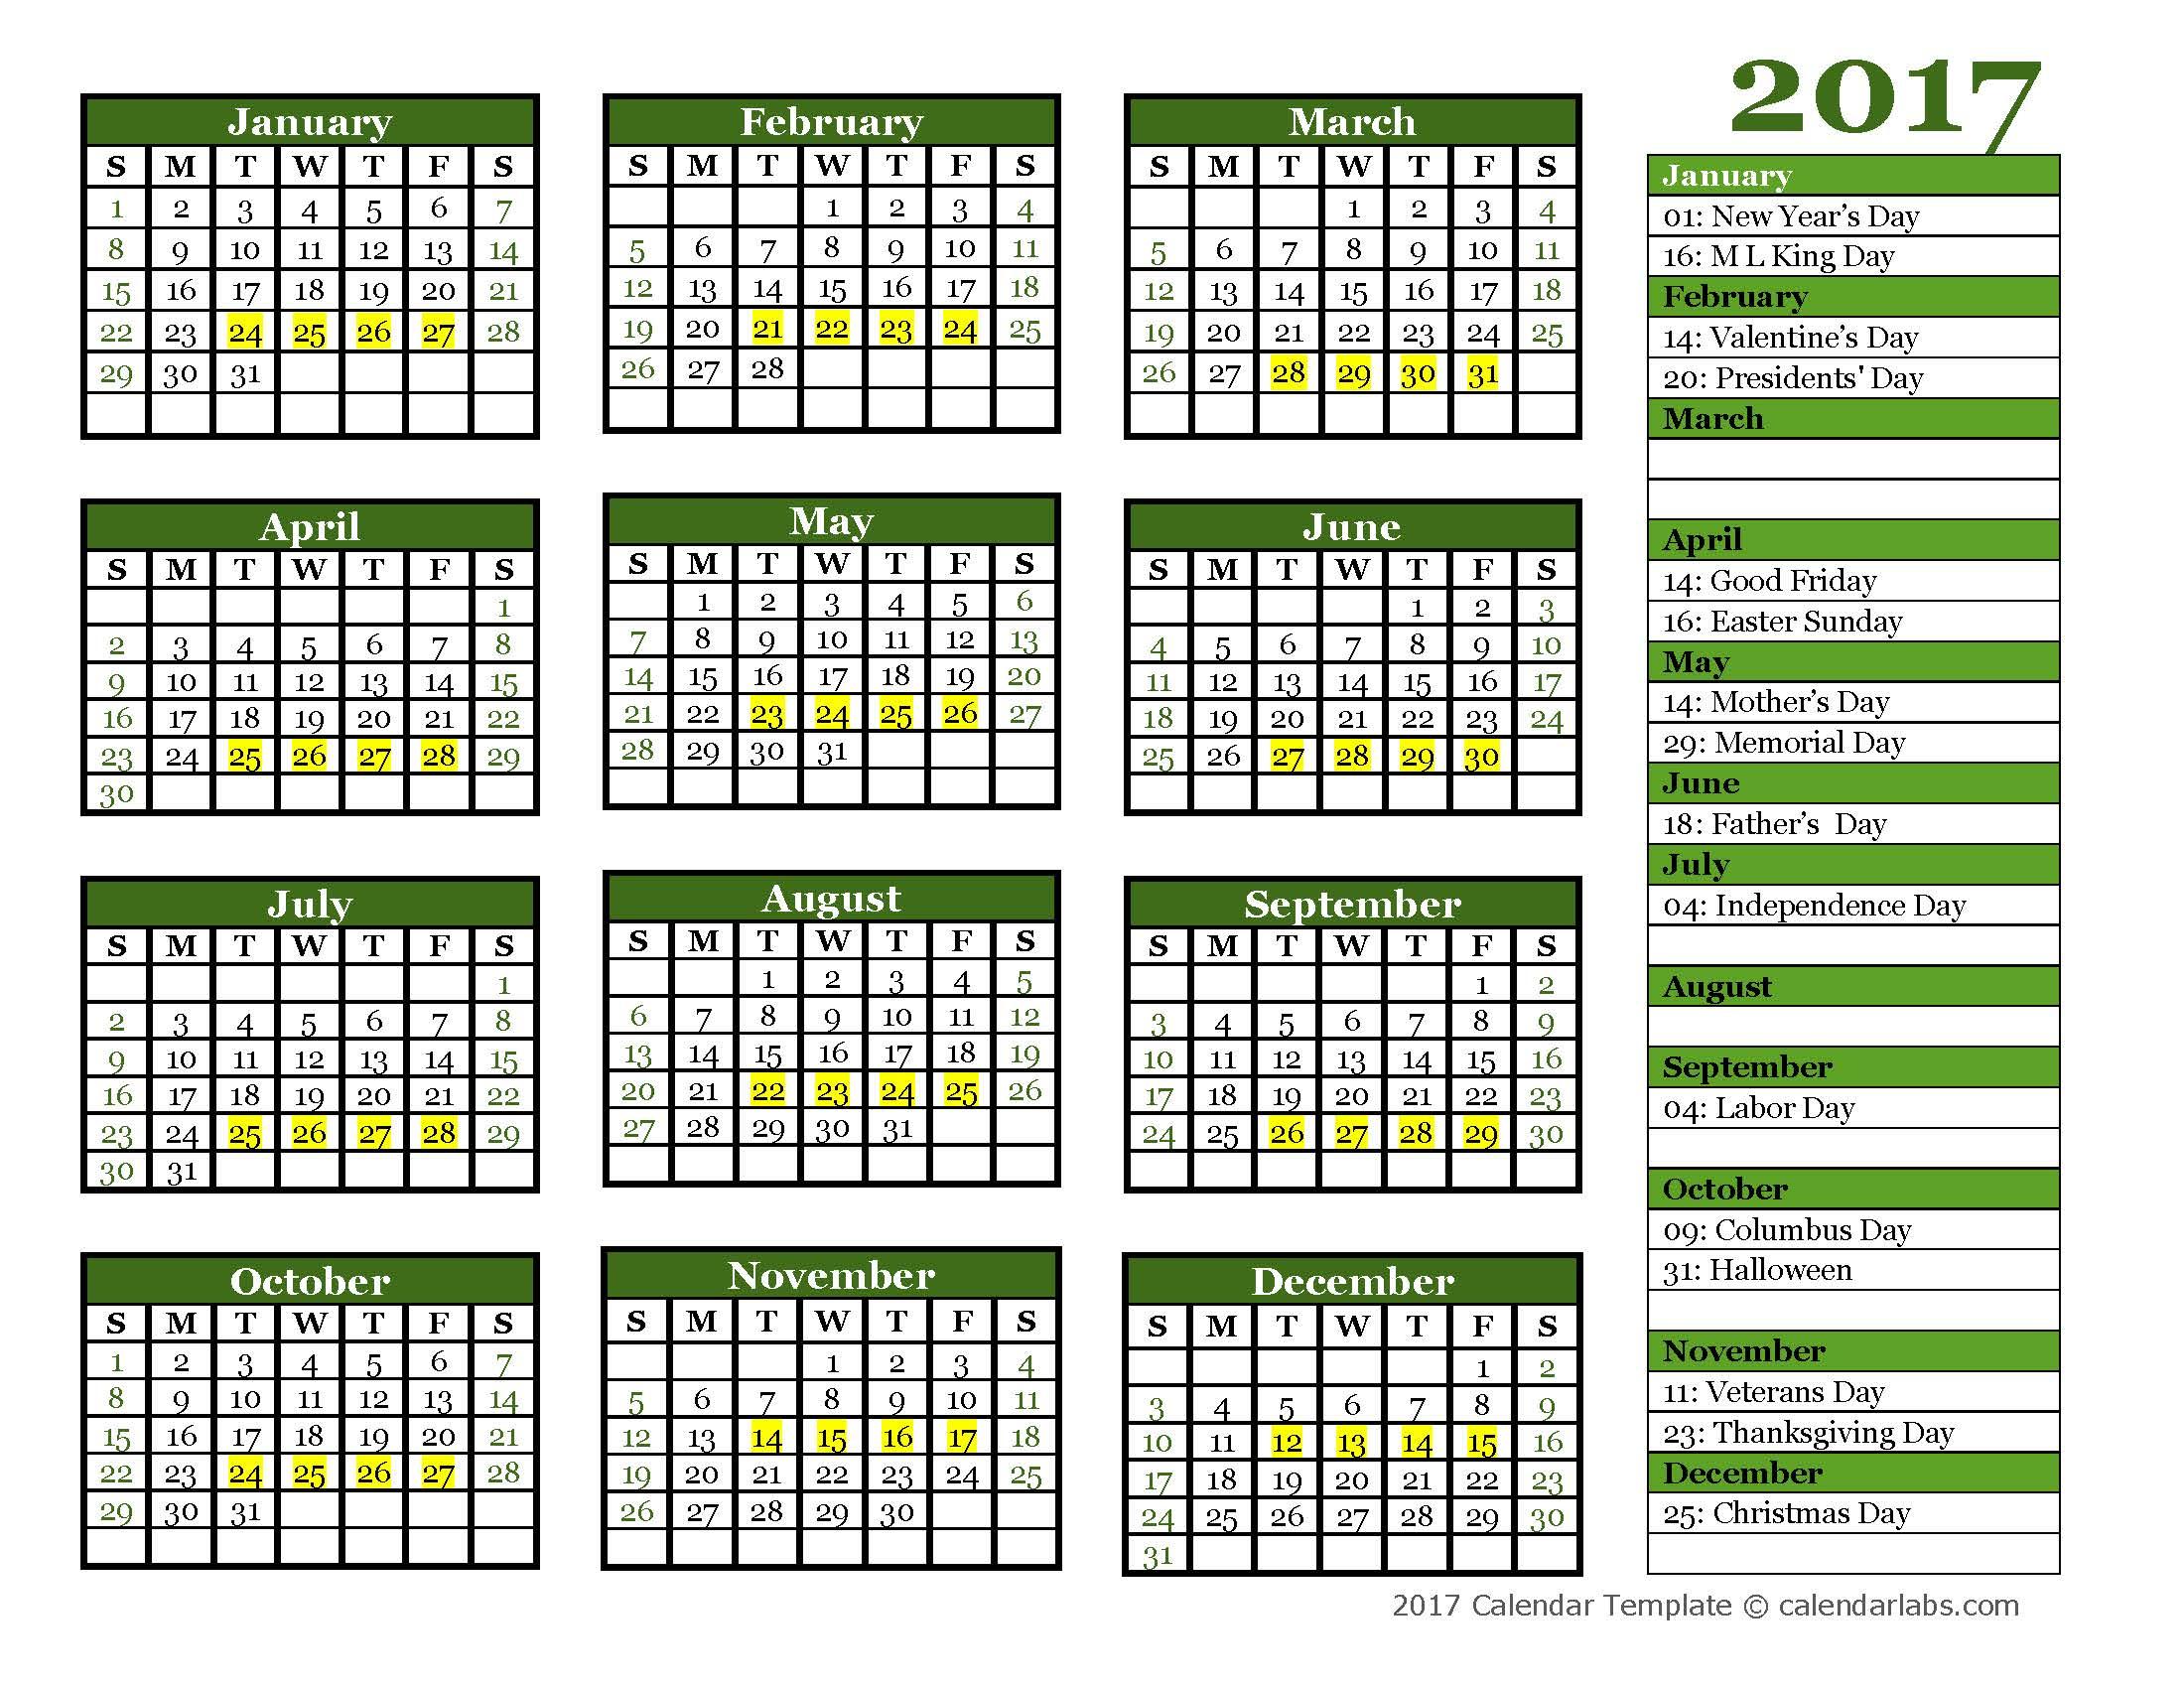 Training Schedule Calendar Template